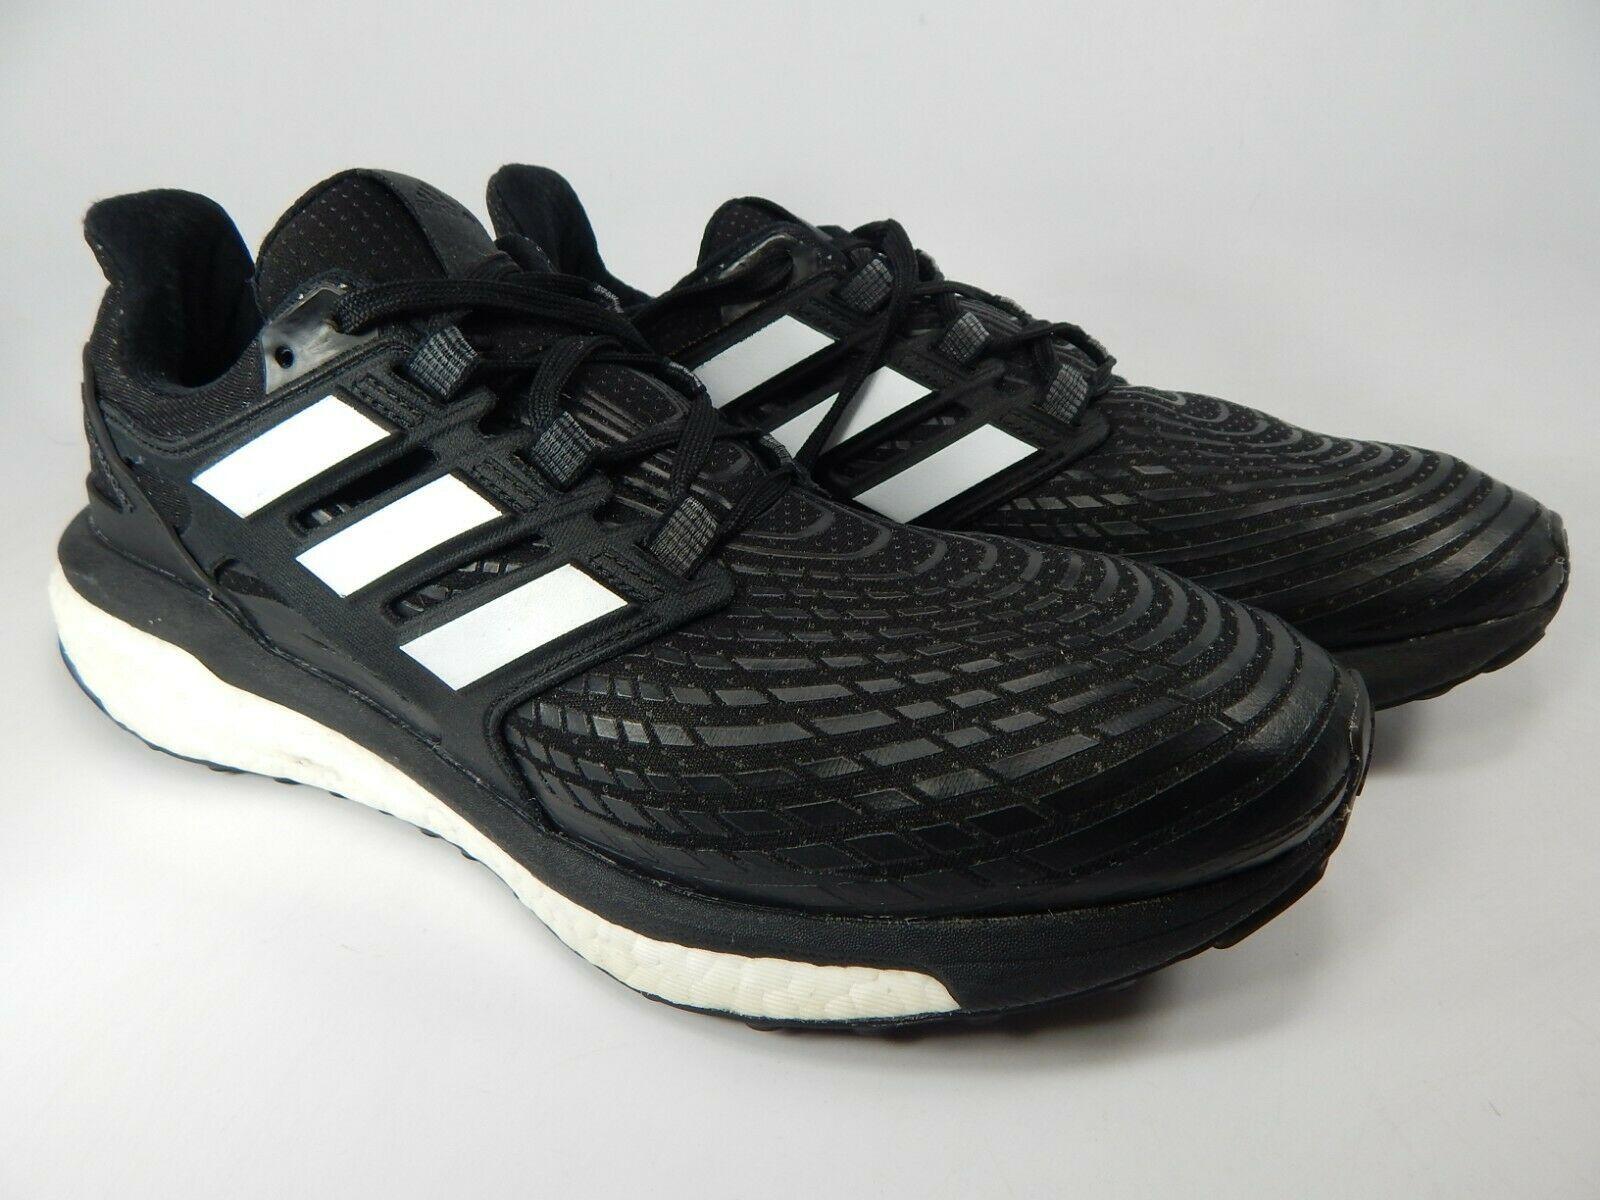 Adidas Energy Boost Misura USA 9.5 M (D) Eu 43 1/3 Uomo Scarpe da Corsa Nero image 2